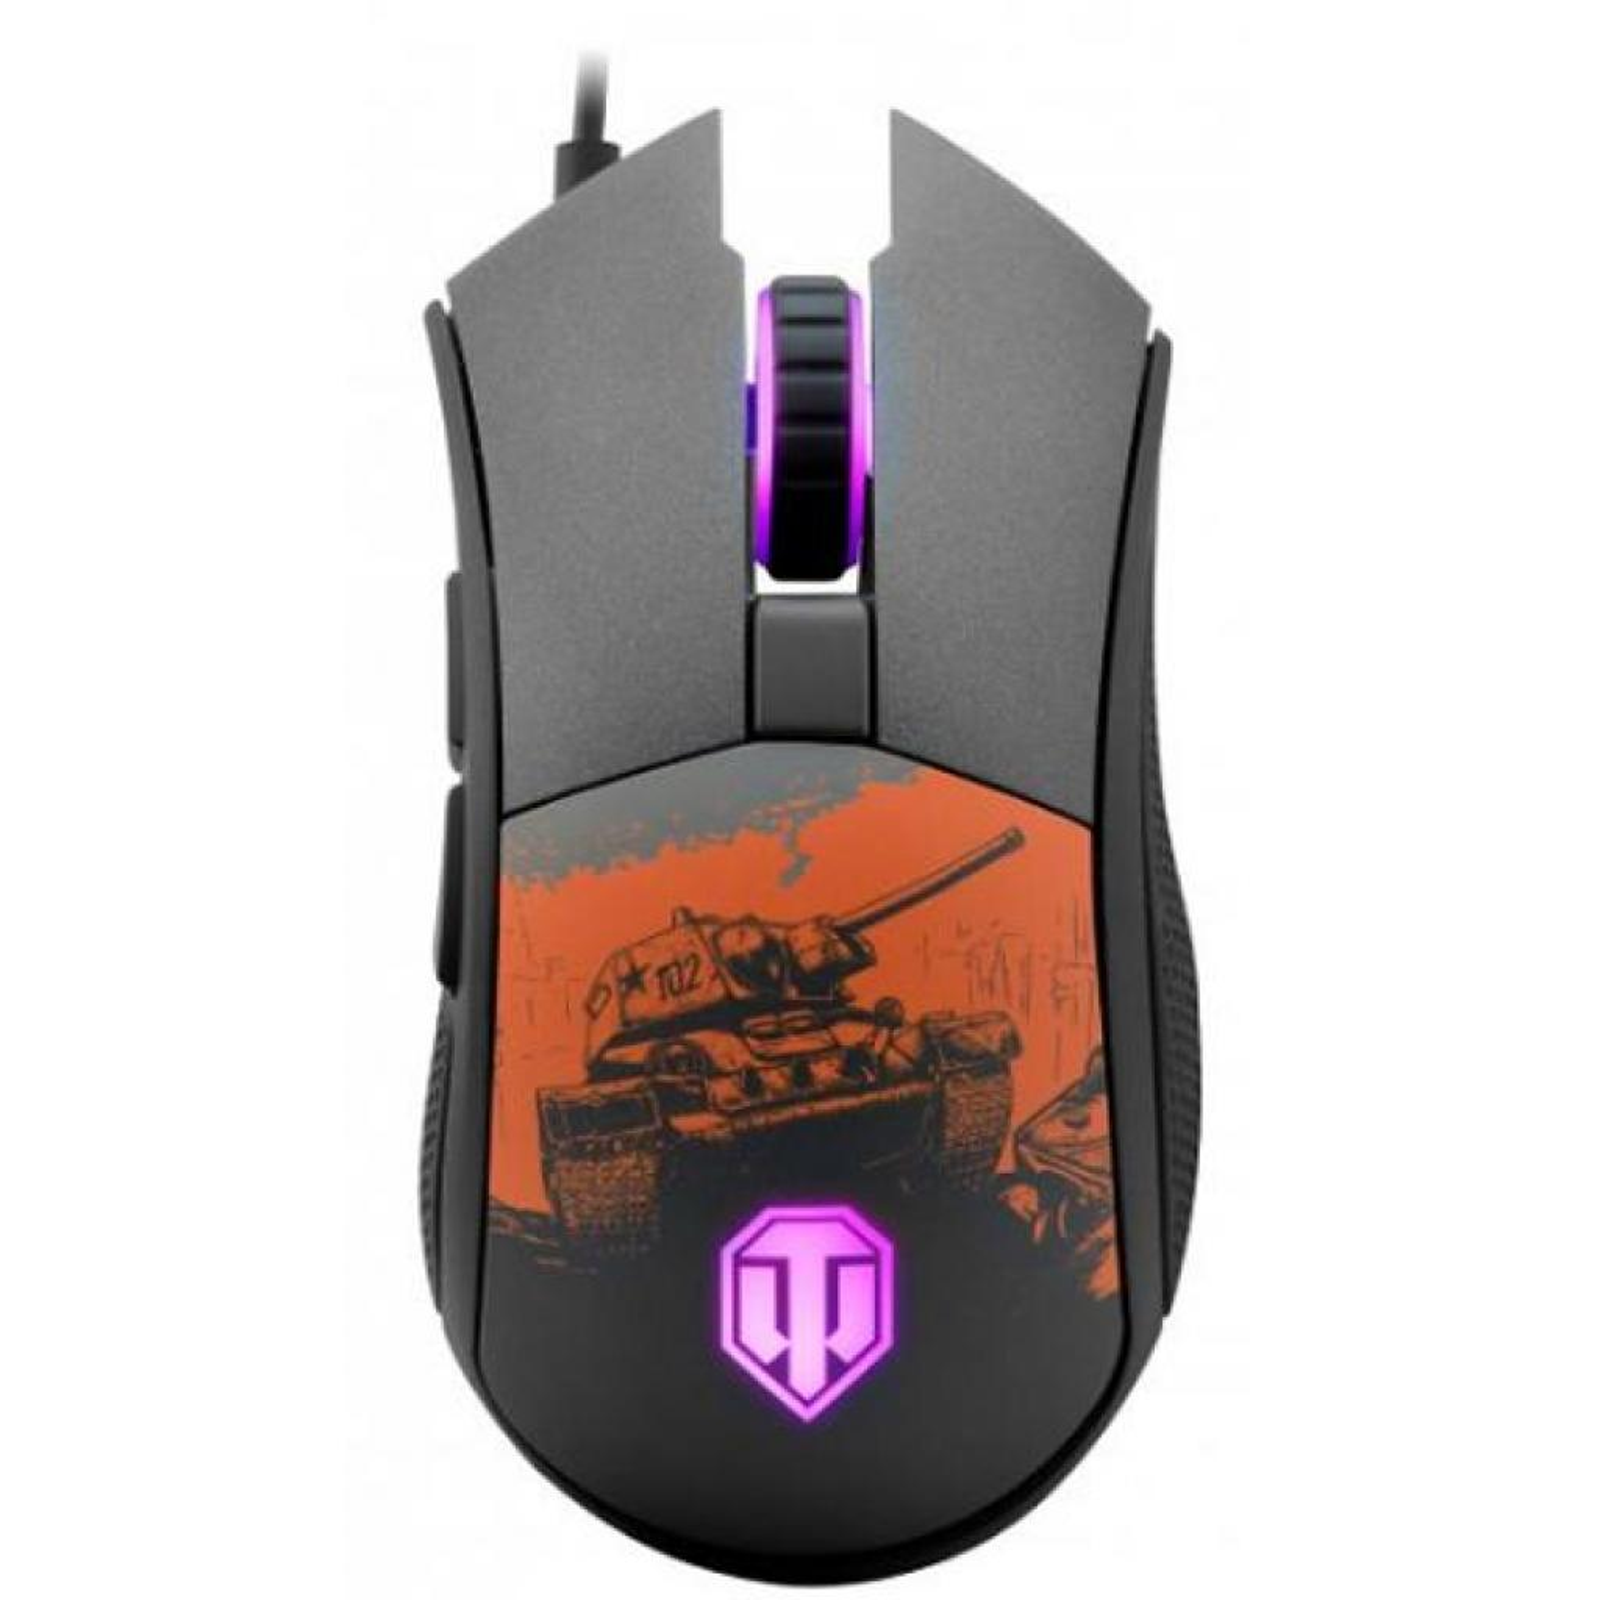 Мышка Cougar Revenger S World of Tanks изображение 3